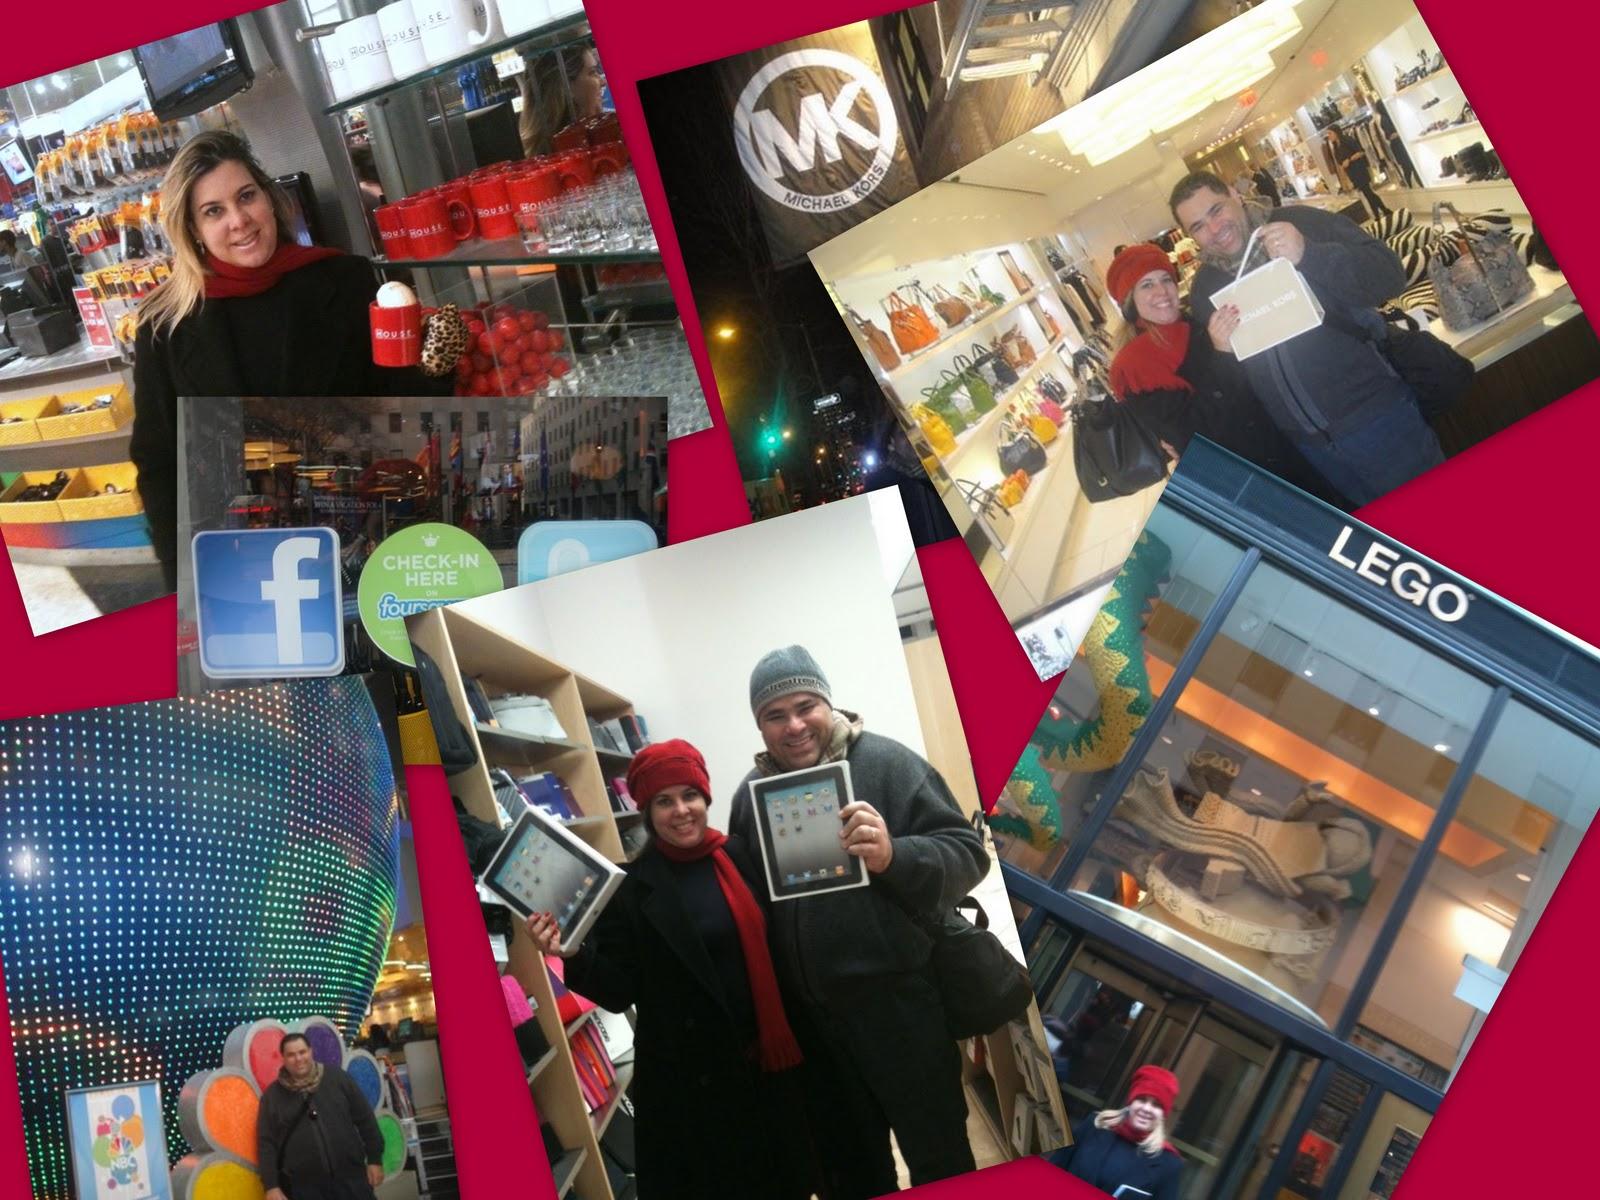 Patixs presentes compras em nova york for Burlington coat factory jersey garden mall